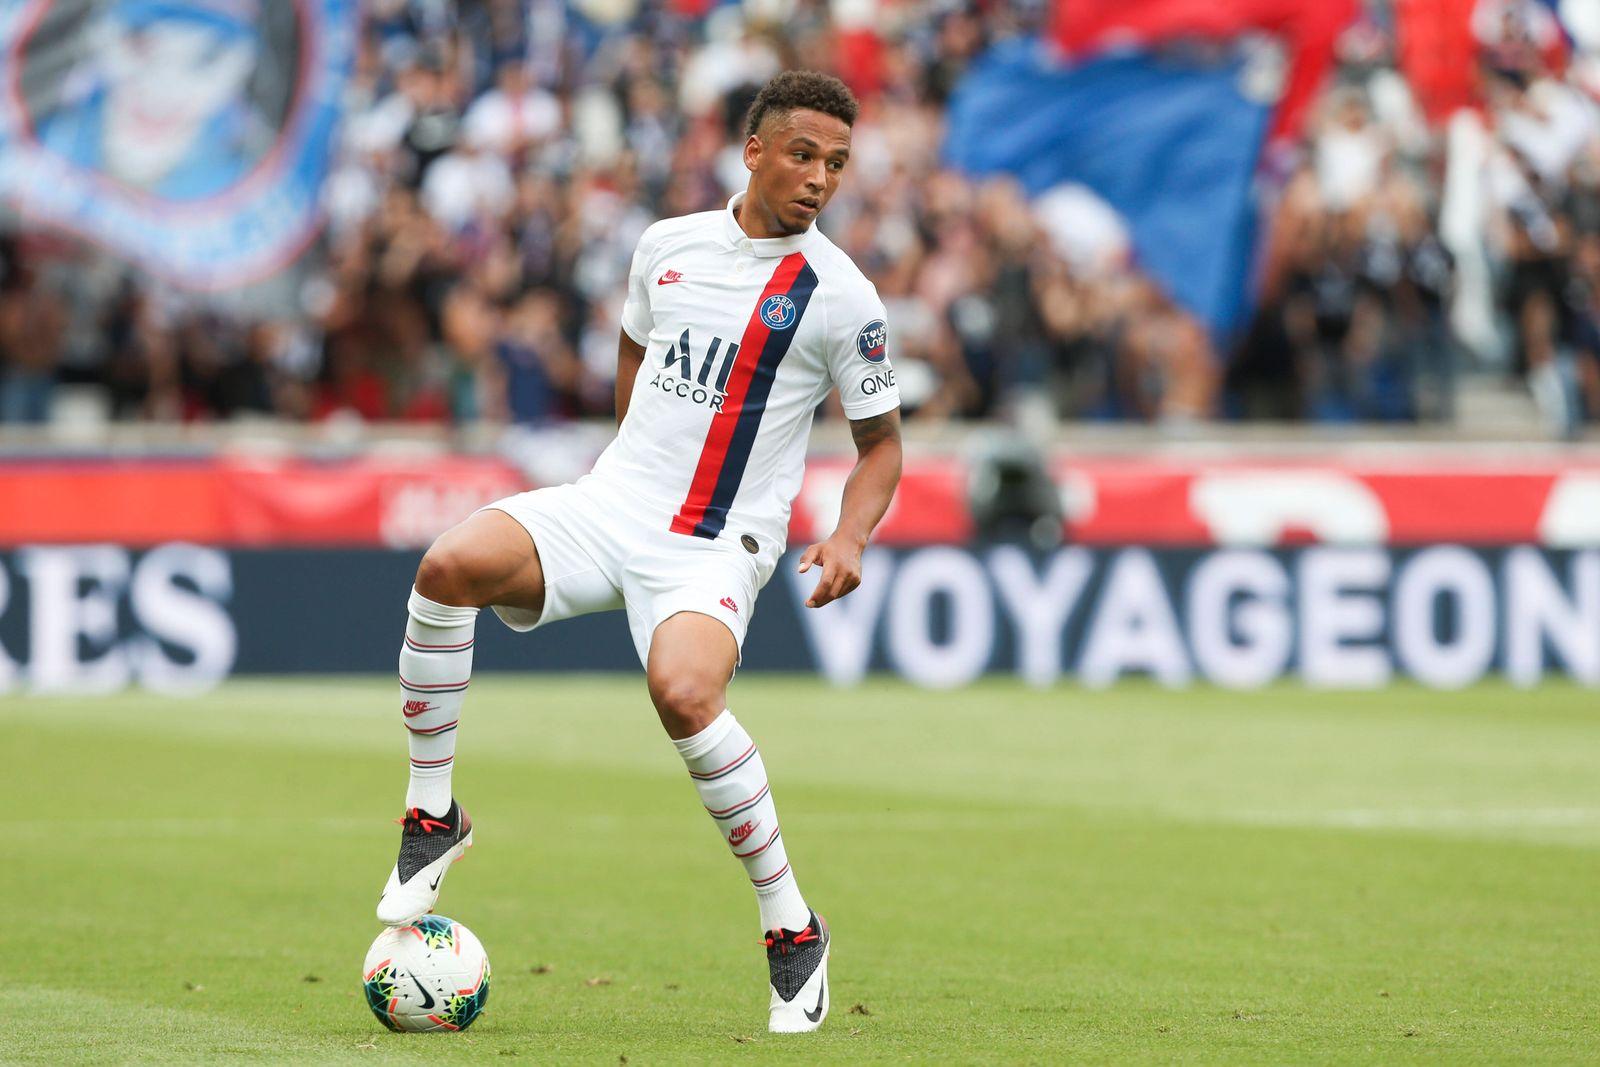 Thilo Kehrer (PSG) FOOTBALL : Paris Saint Germain Vs Waasland-Beveren - Amical - 17/07/2020 MichaelBaucher/Panoramic PUB